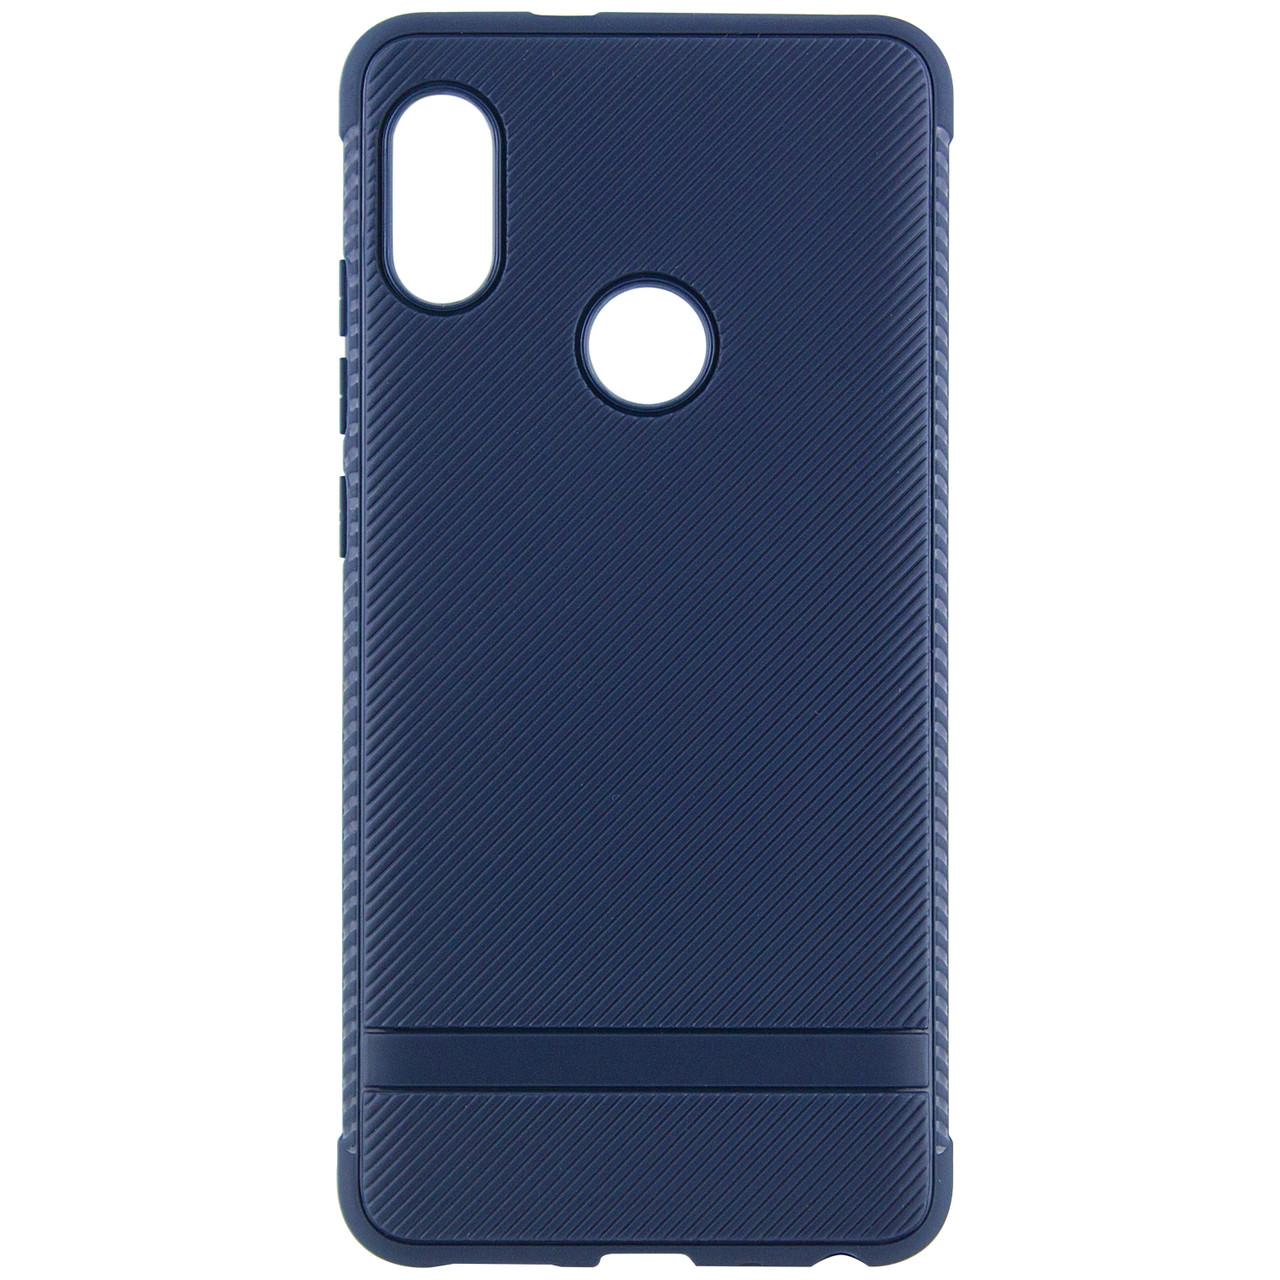 TPU чехол Stylish Series для Xiaomi Redmi Note 5 Pro / Note 5 (DC)